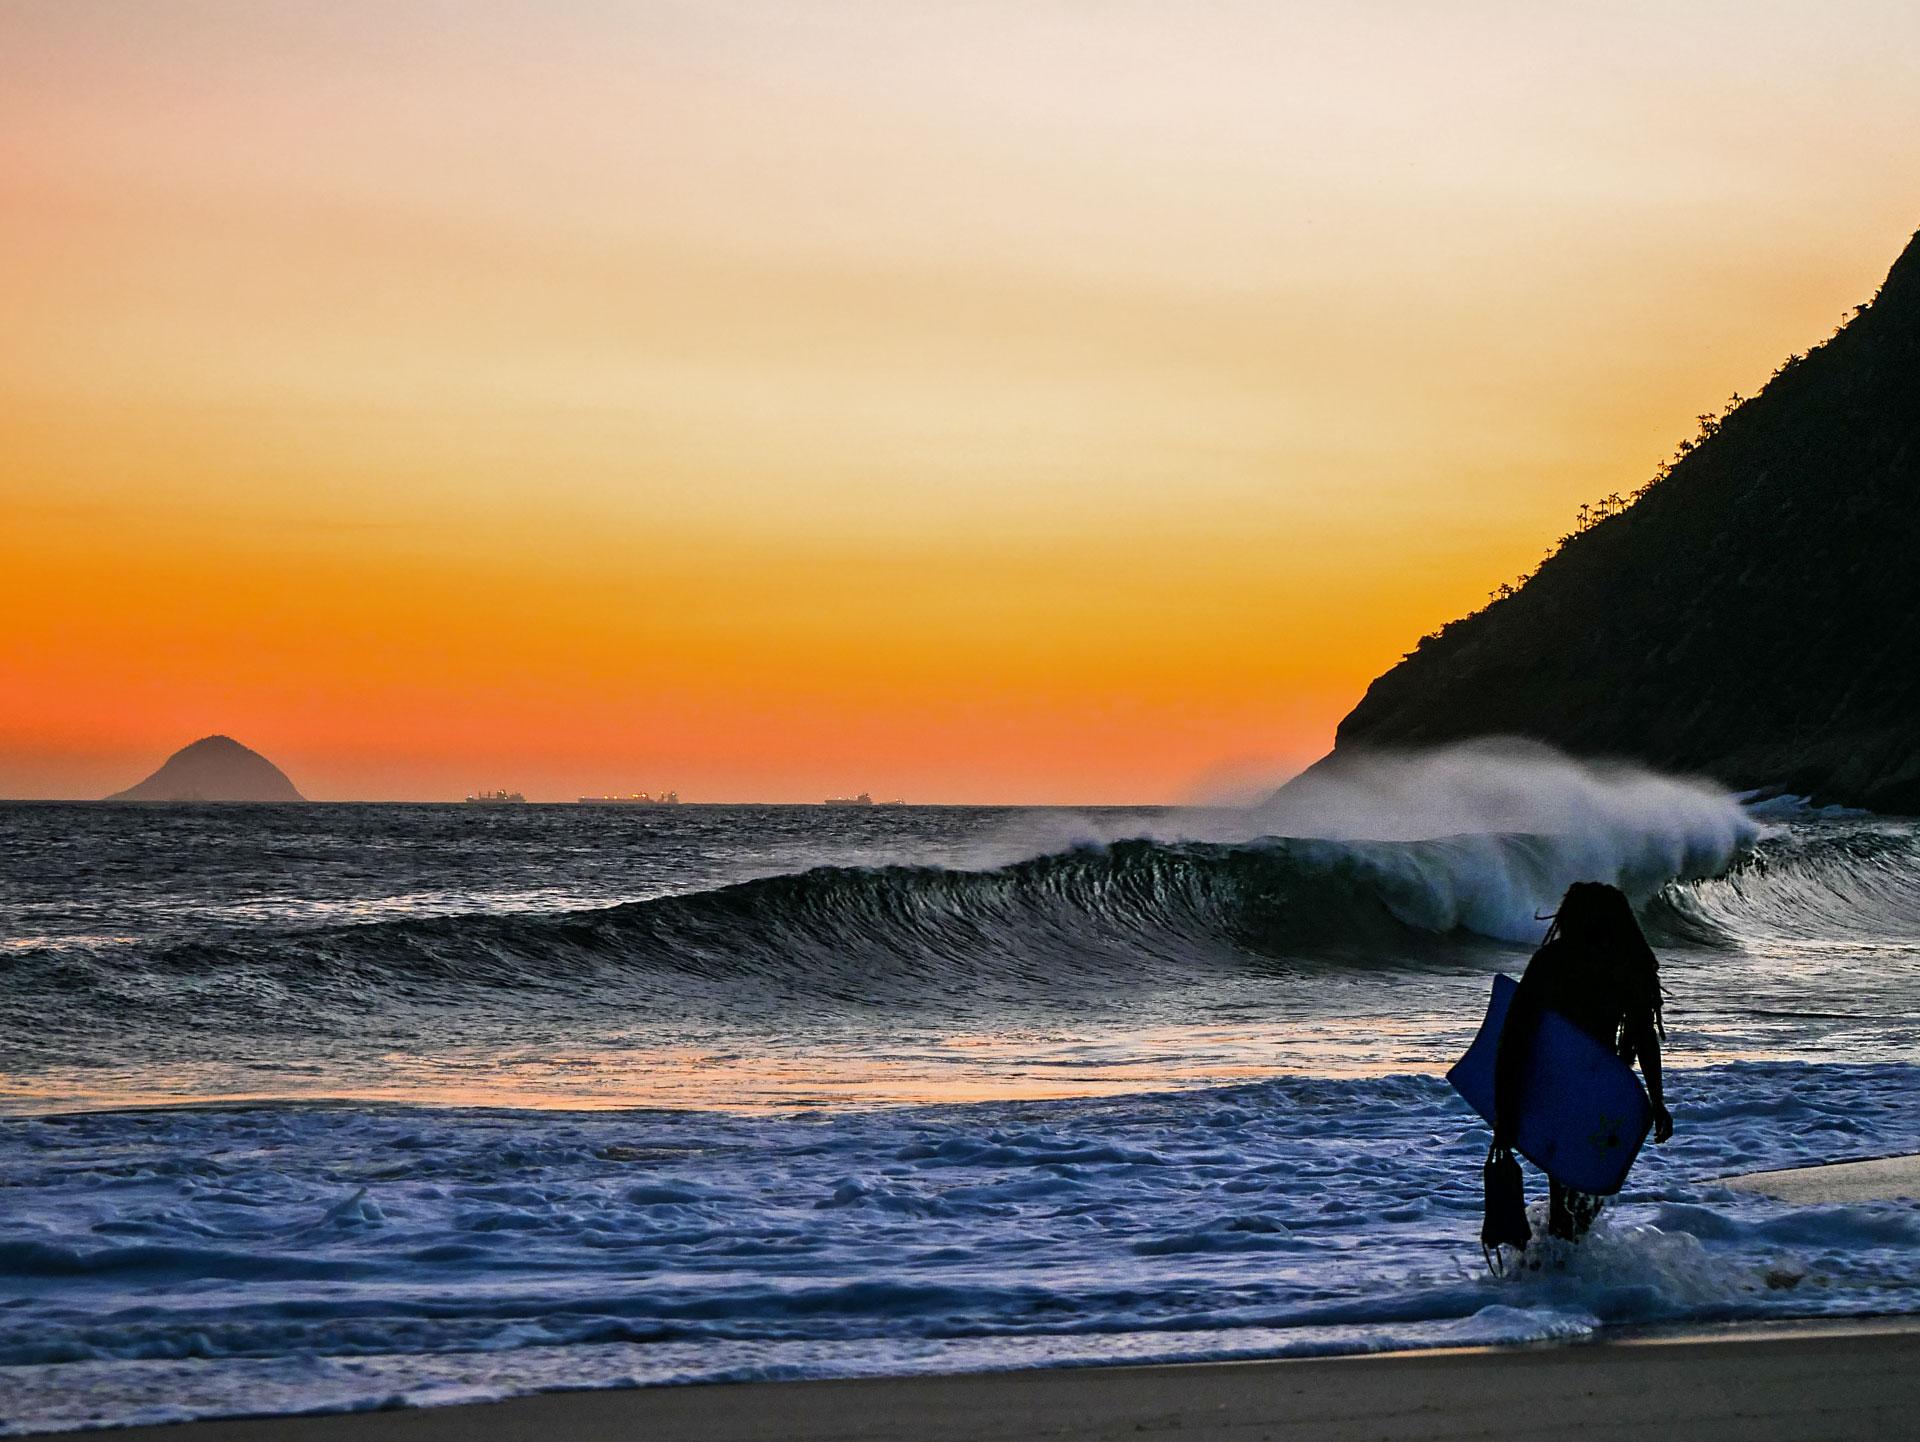 Rasta bodyboarder watching sunset at Itacoatiara beach, Brazil